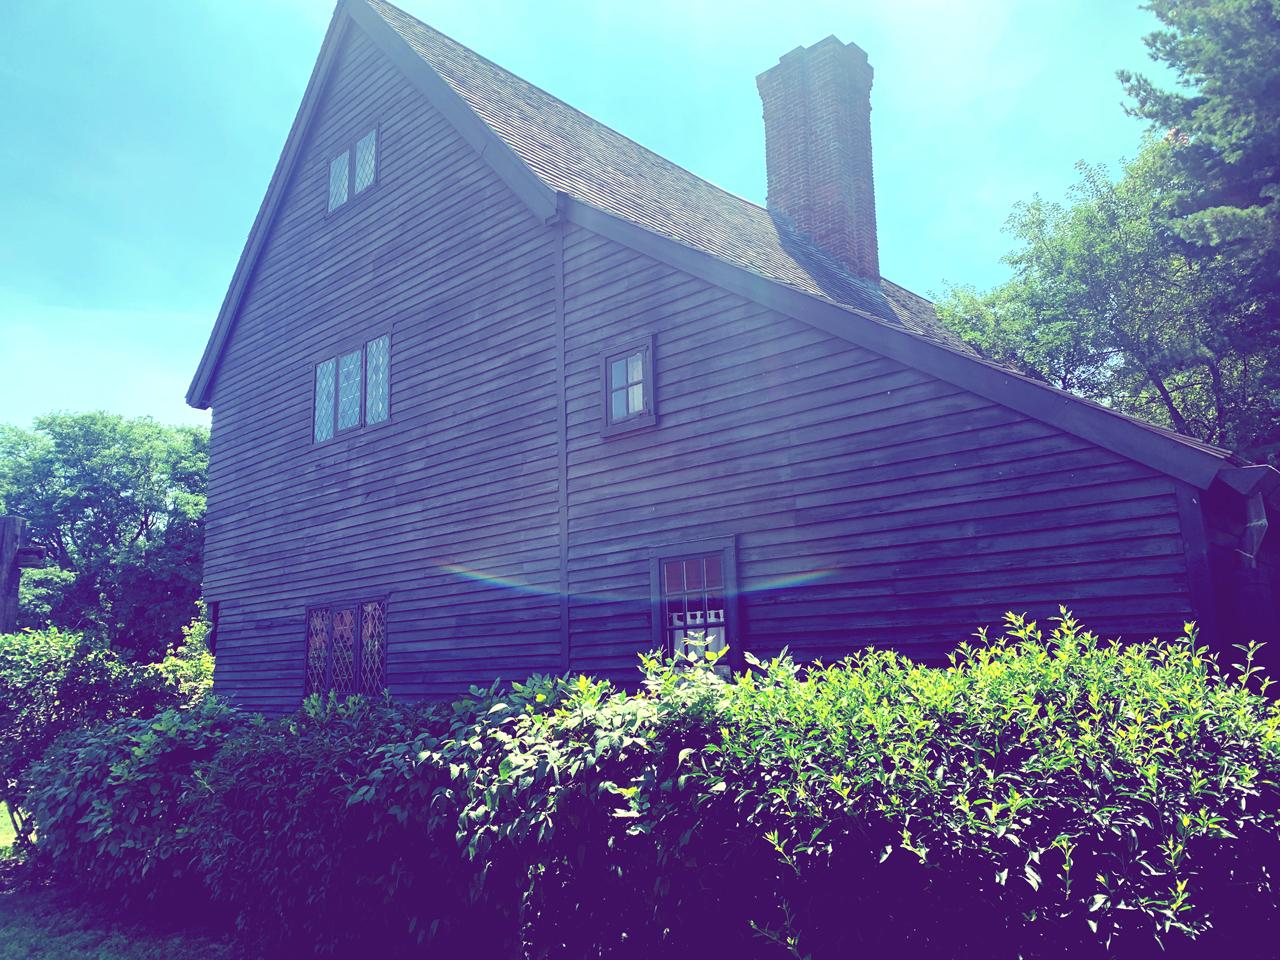 witch-house-salem-massachusetts-1280x960-03